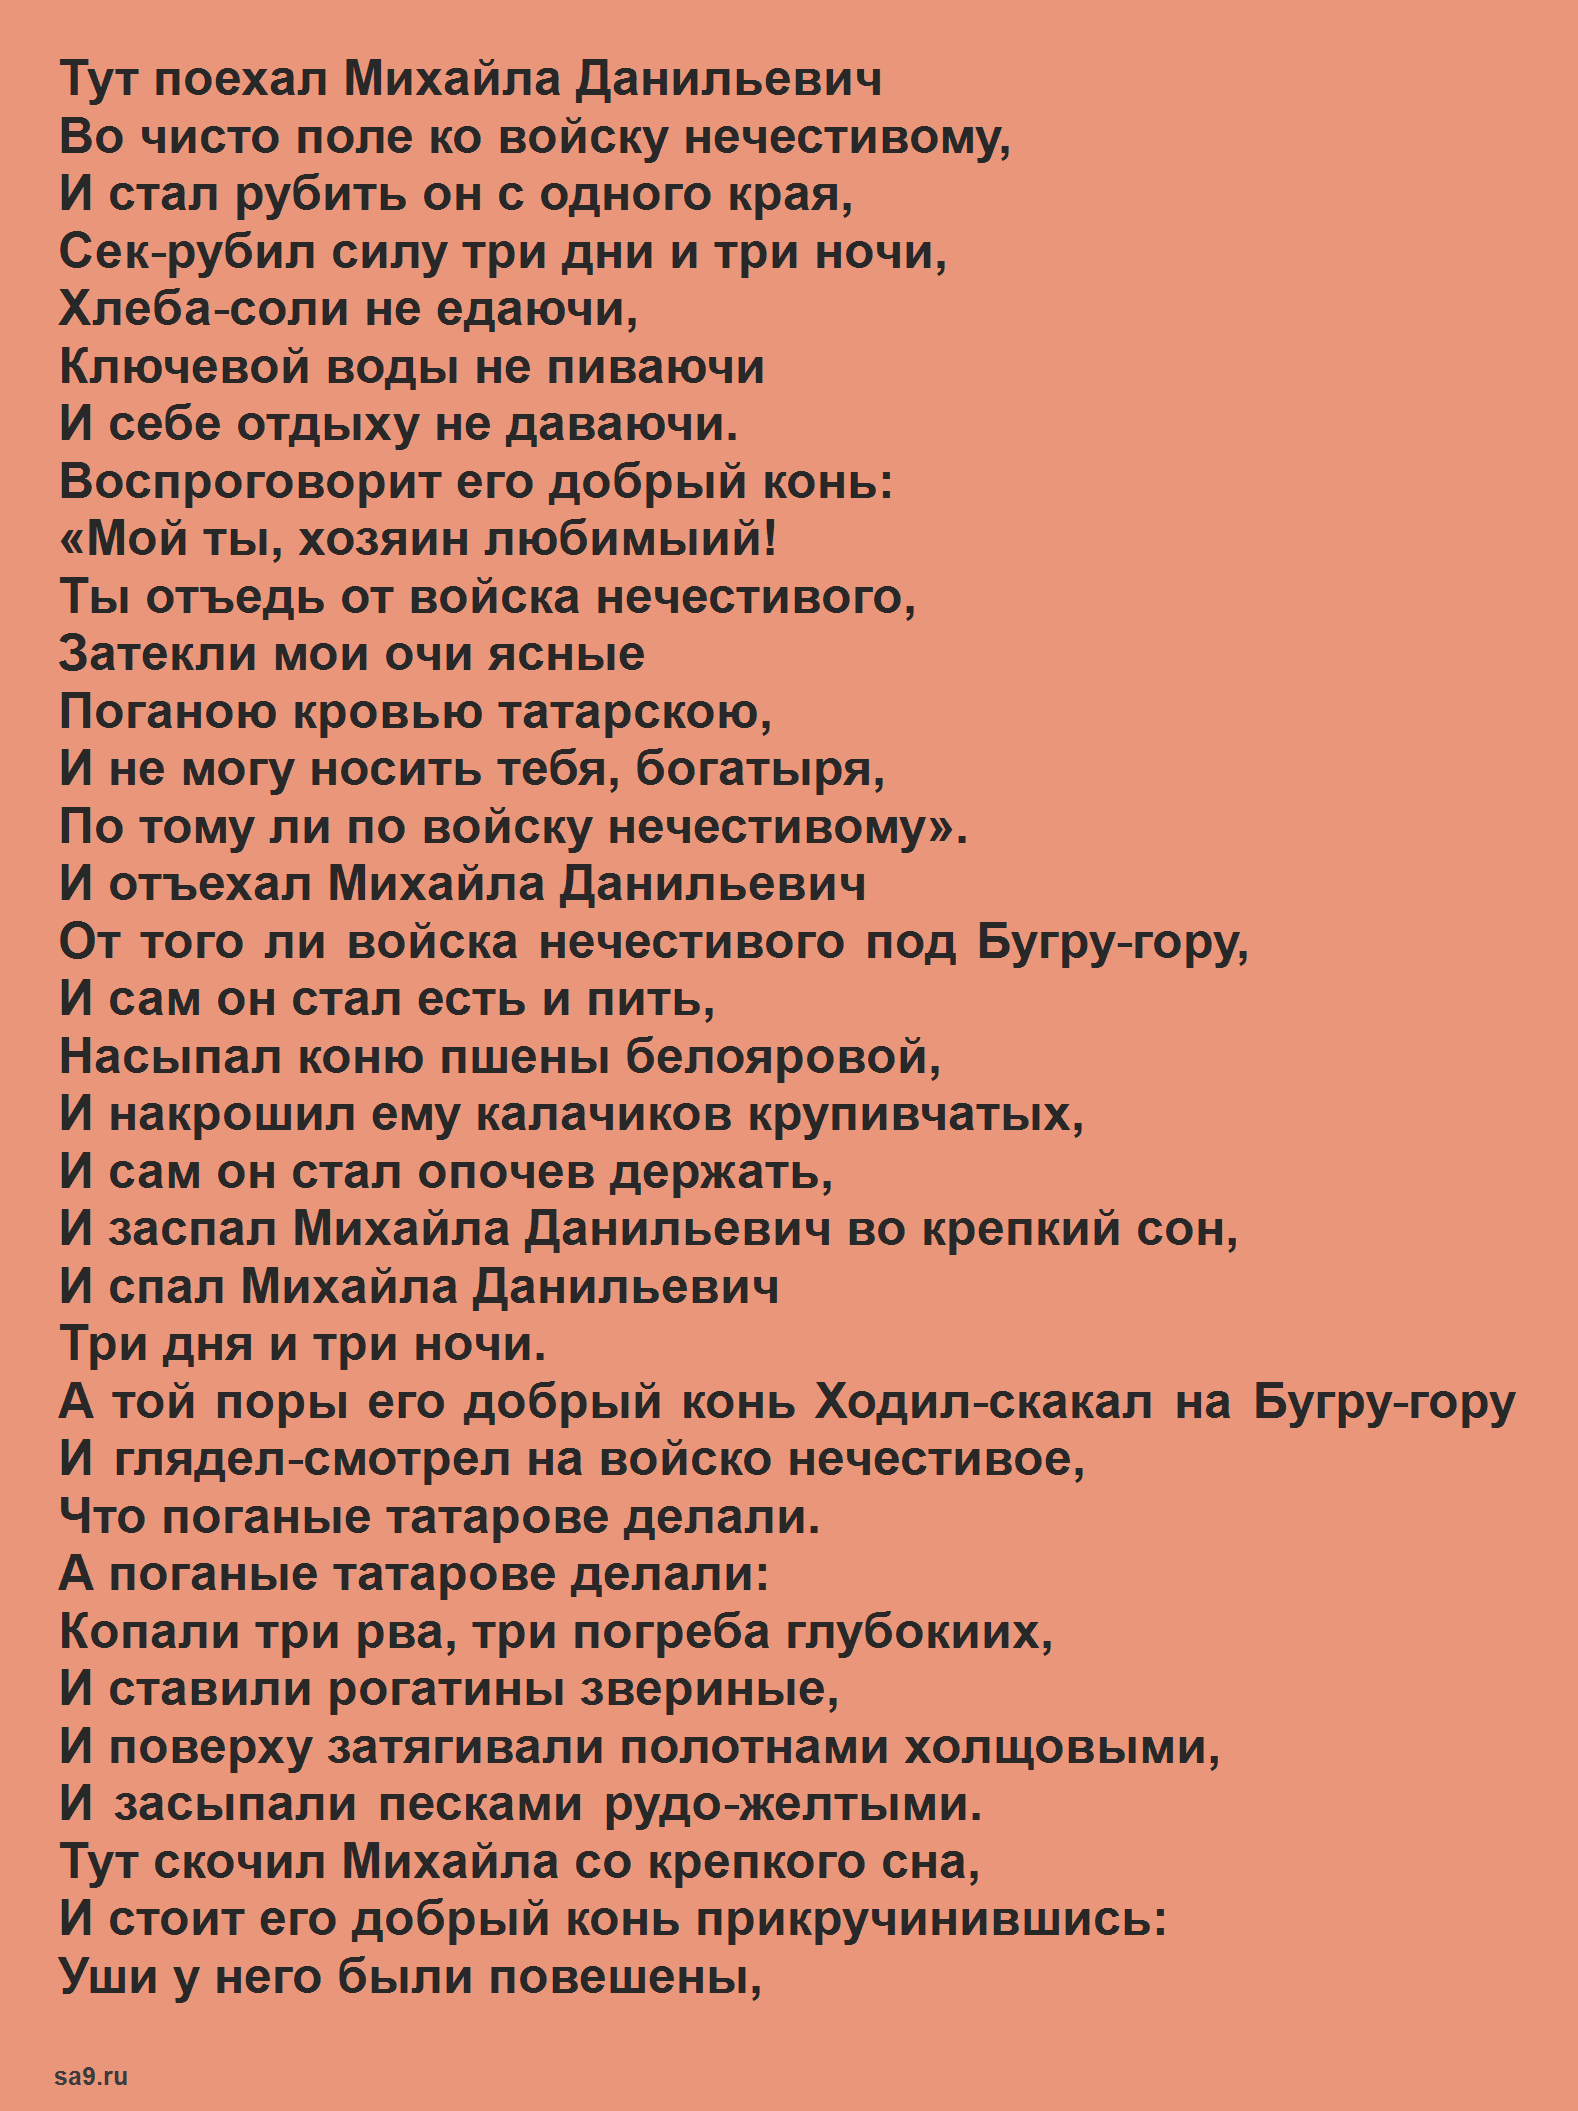 Былина - Михайло Данилович